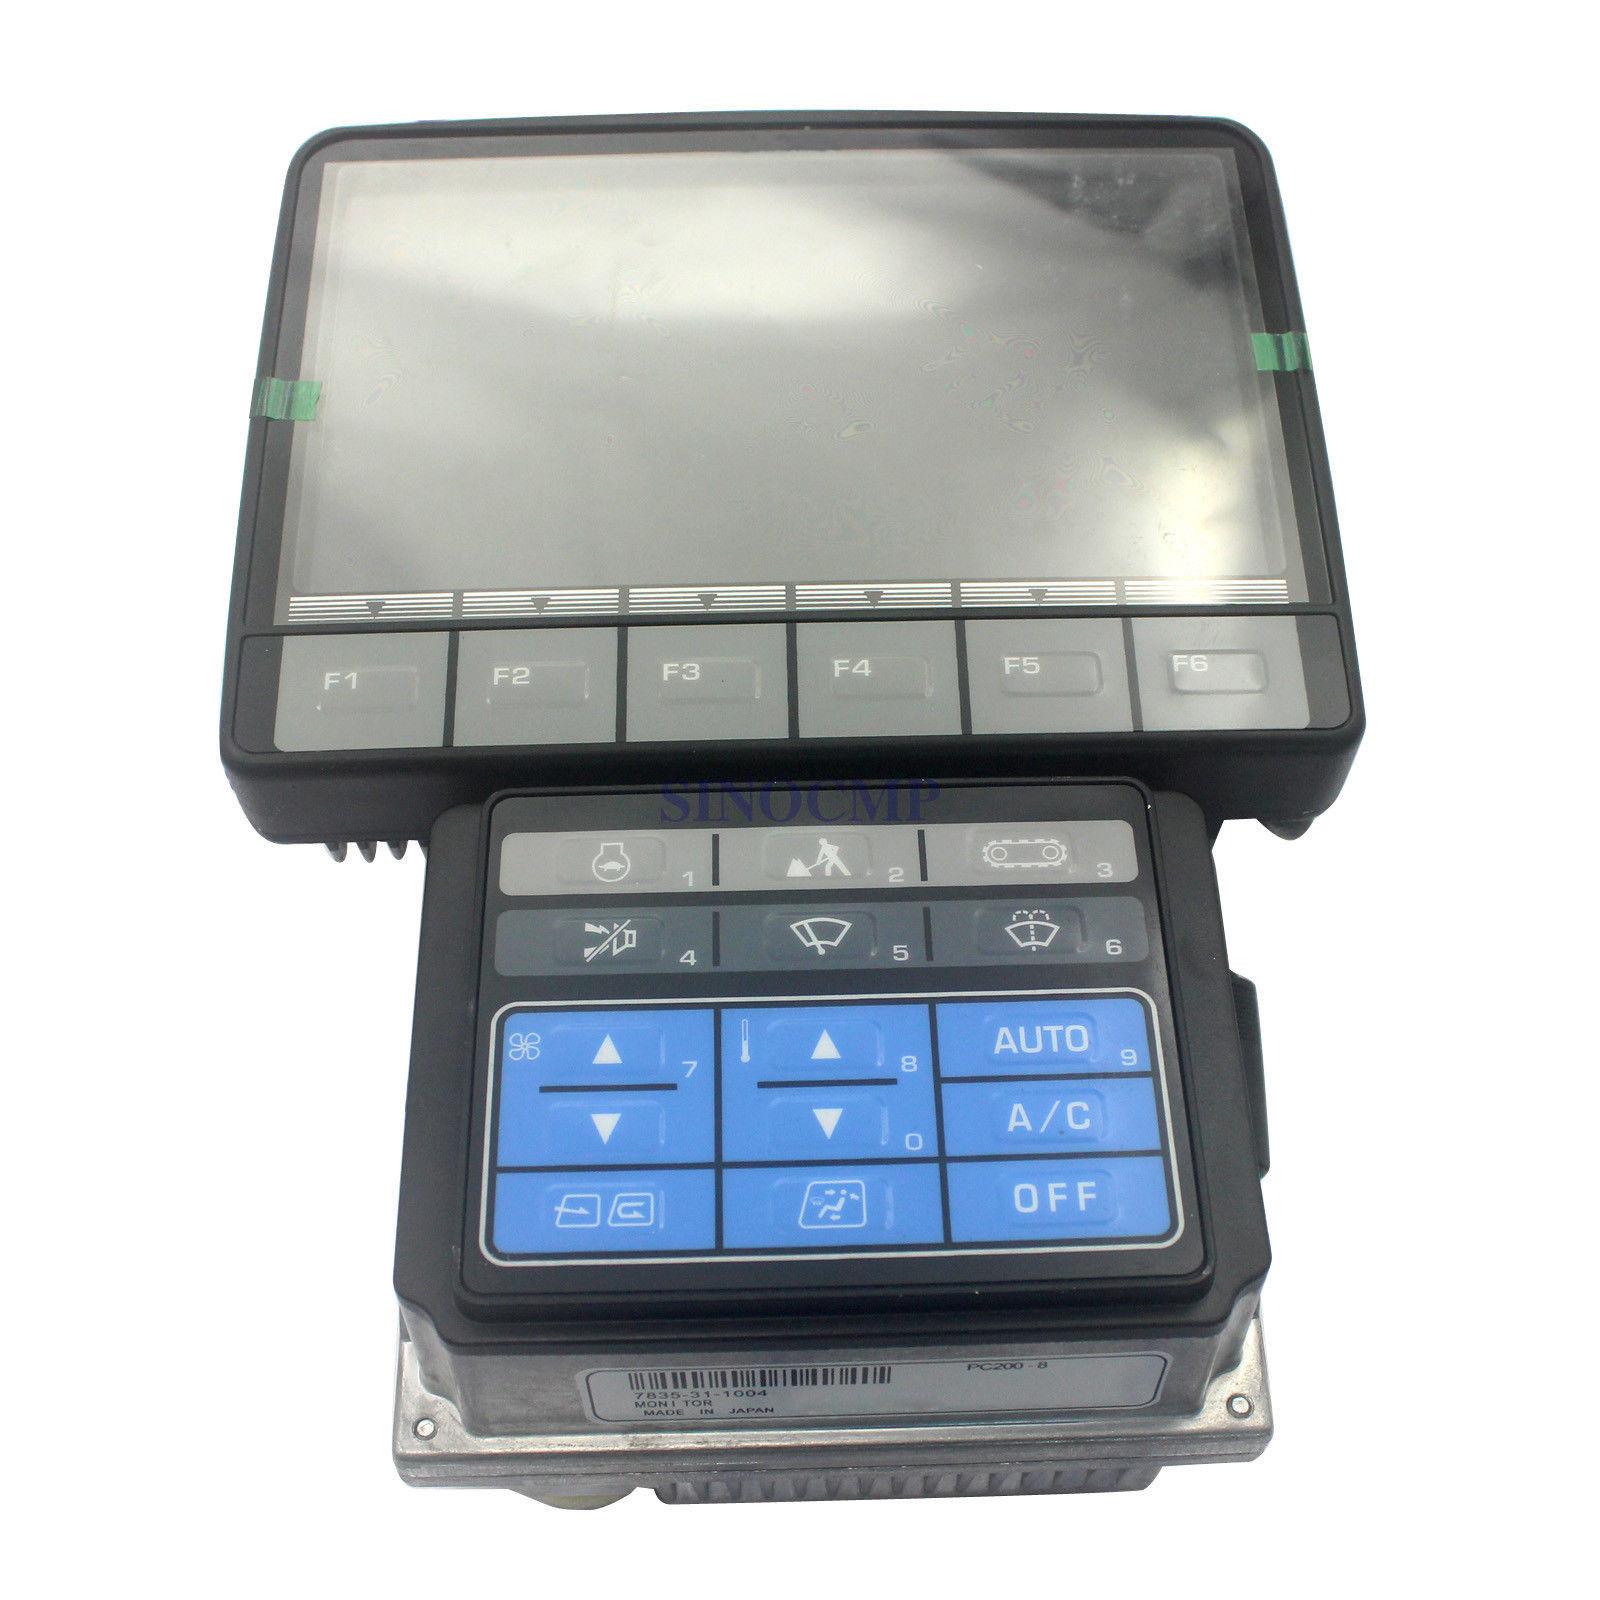 PC200-8 PC220-8 Monitor Display Panel 7835-31-1000 7835-31-1001 for Komatsu Excavator, 1 year warranty connector plug fits komatsu pc200 8 pc 8 excavator controller 7835 46 1007 3 month warranty